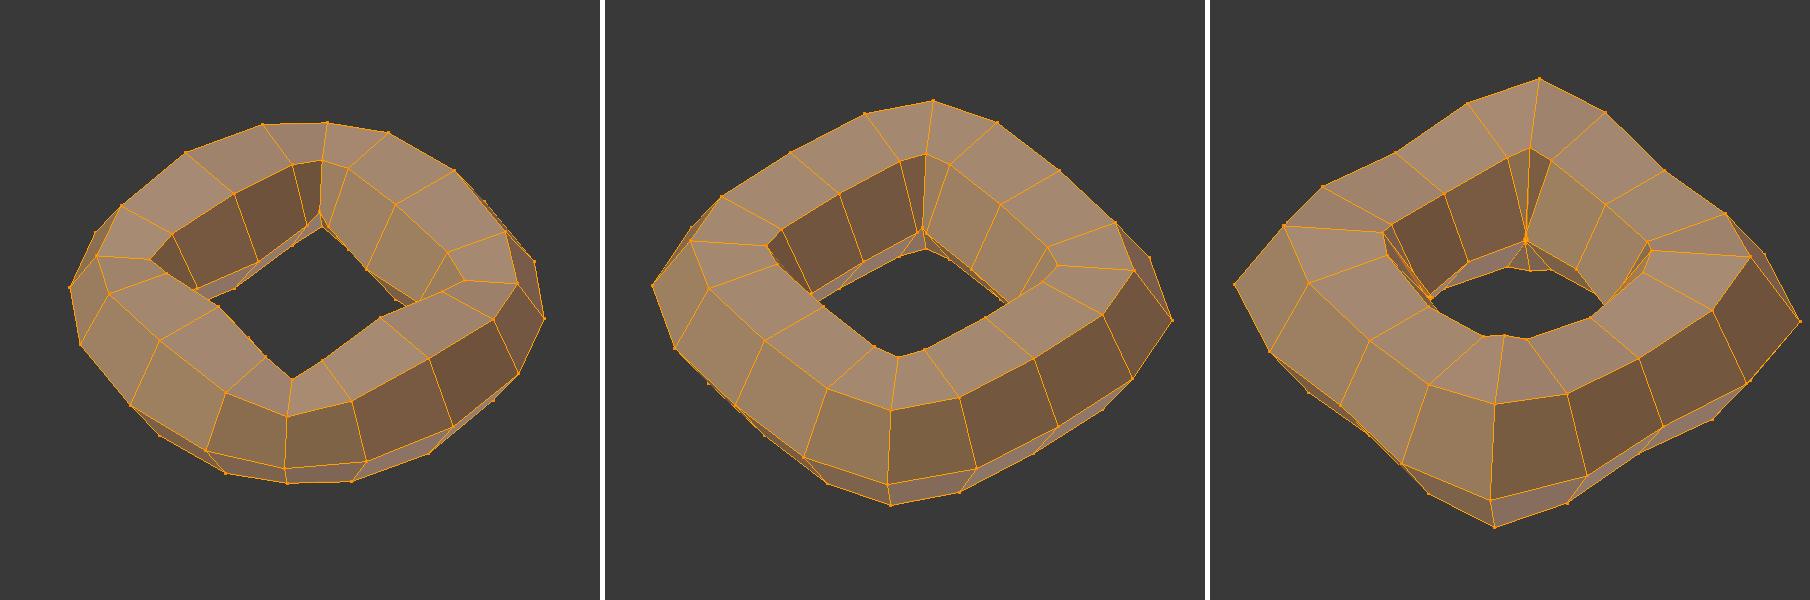 bridge-edge-loops-profile